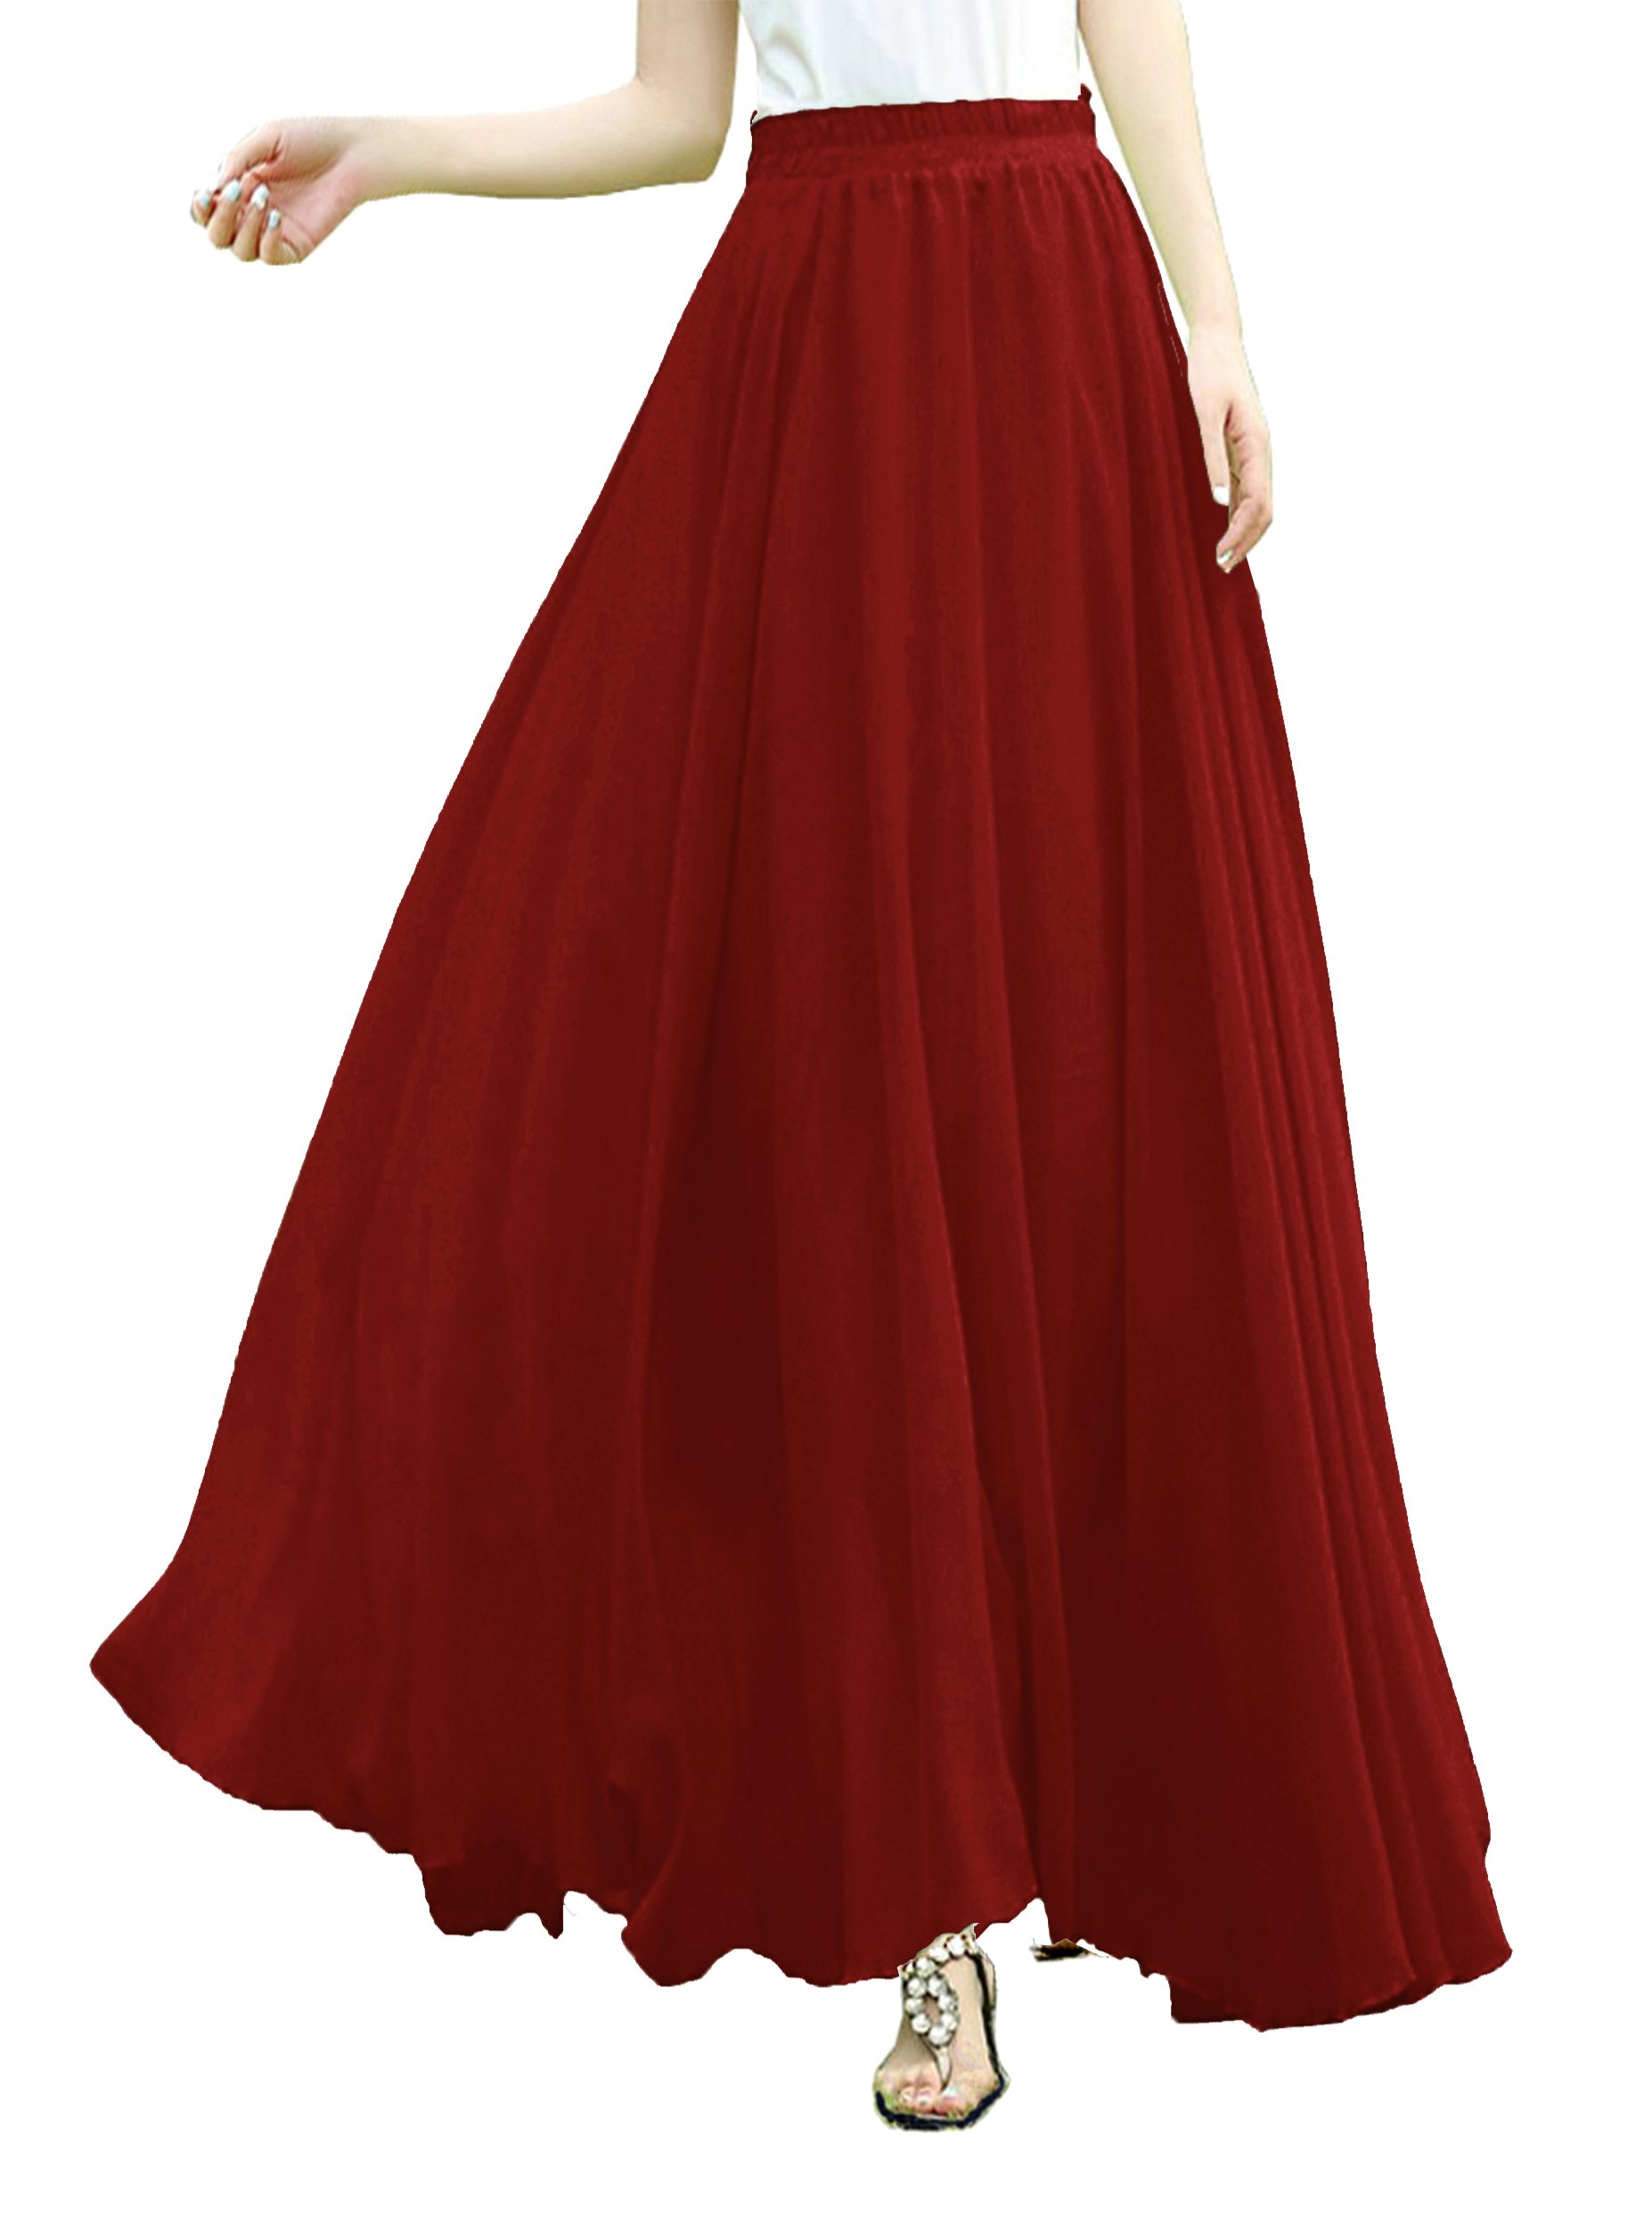 v28 Women Full/Ankle Length Elastic Pleated Retro Maxi Chiffon Long Skirt (XL,Wine)